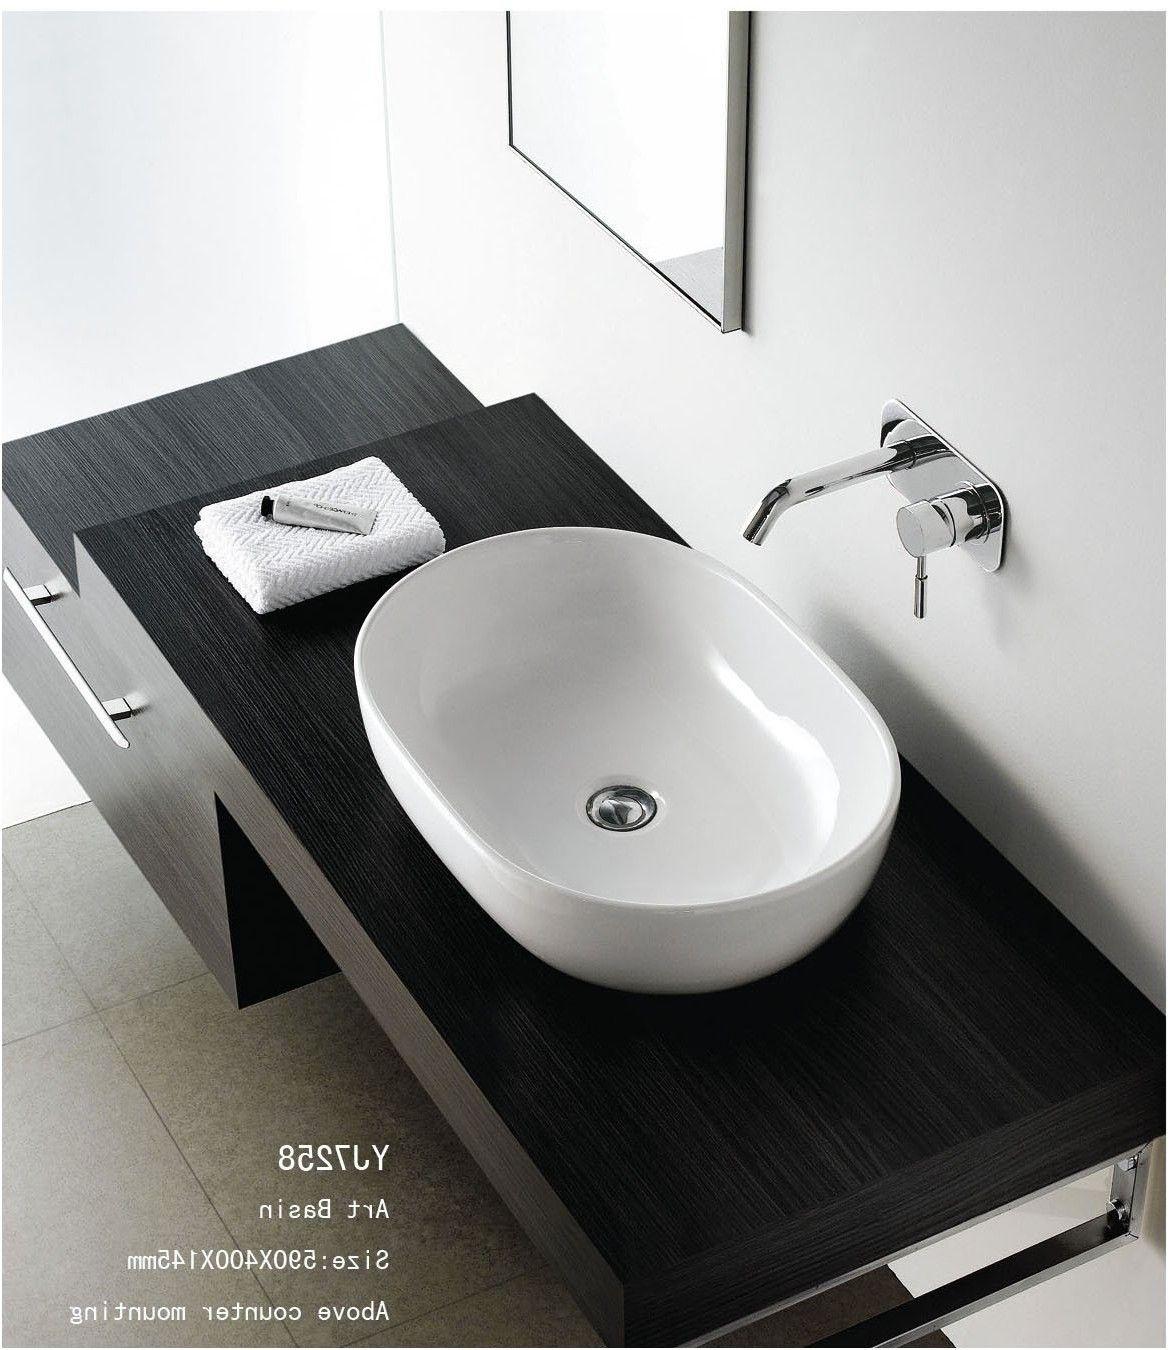 Best Kitchen Gallery: Designer Bathroom Sinks Basins Gurdjieffouspensky From Bathroom Wash of Designer Bathroom Sinks  on rachelxblog.com